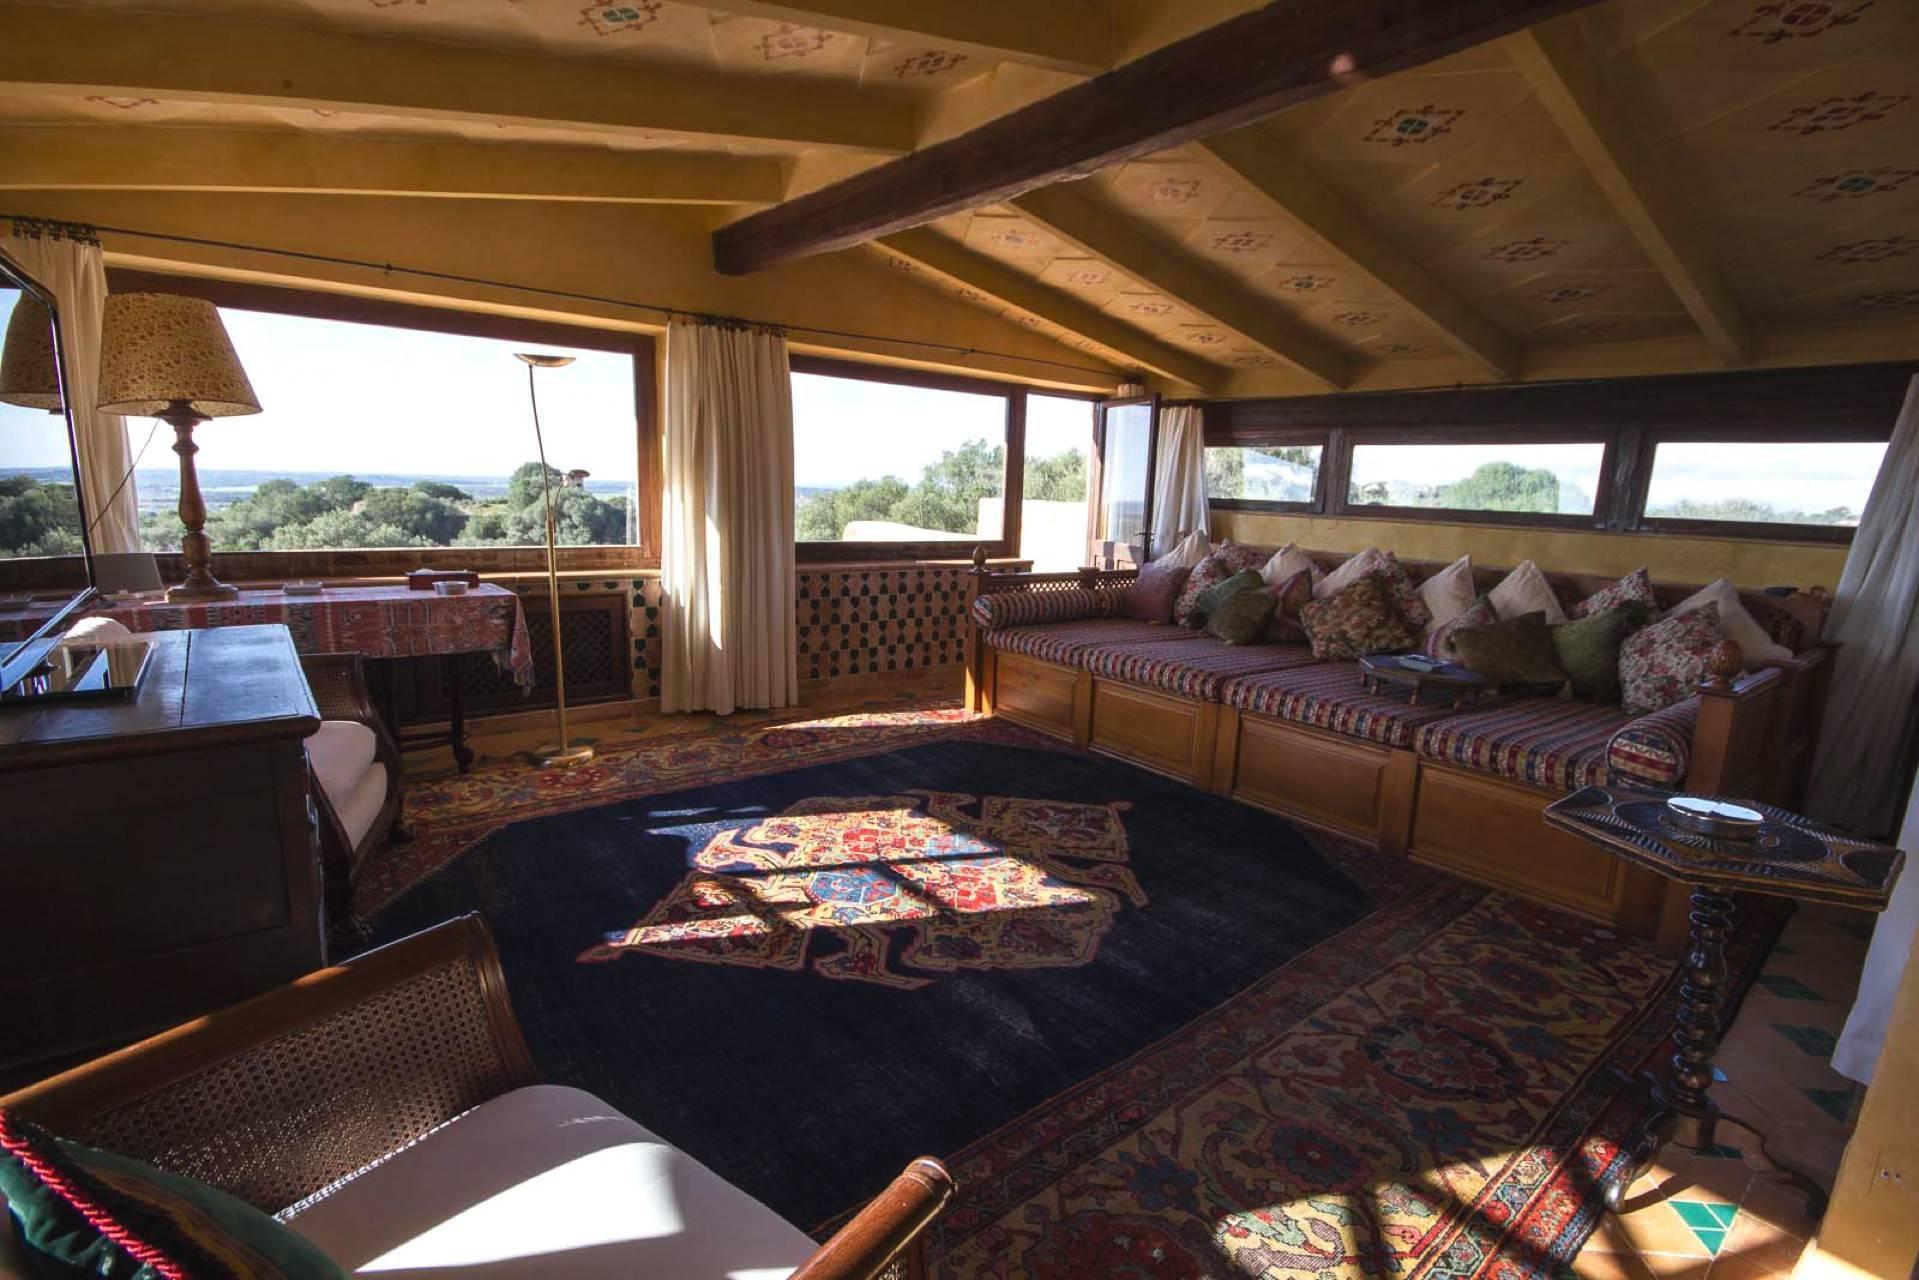 01-116 extravagante luxus Finca Mallorca Süden Bild 31